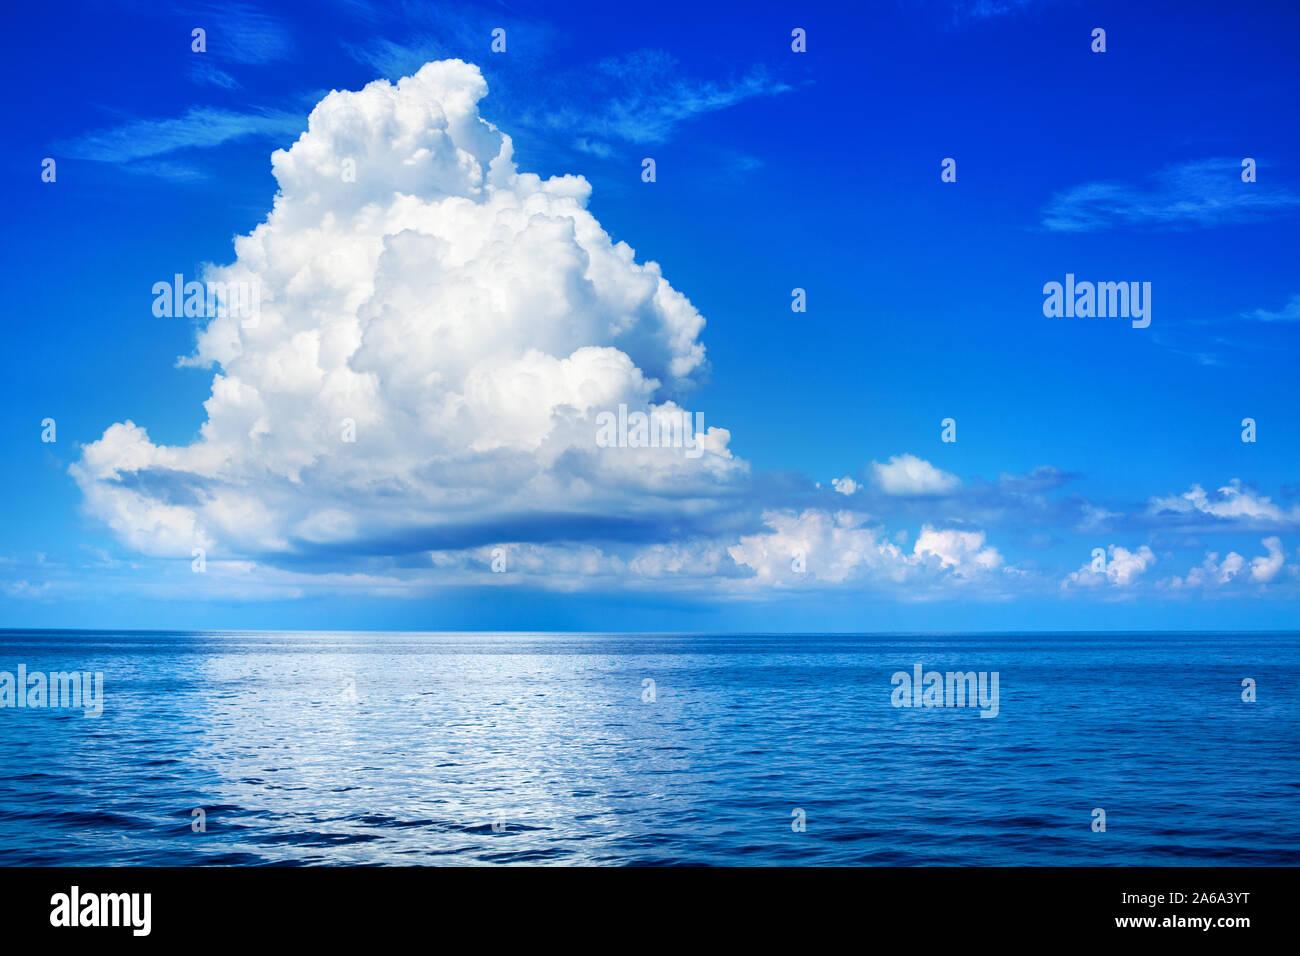 White cumulus clouds in blue sky over sea landscape, big cloud above ocean water panorama, beautiful tropical seascape, cloudy weather, cloudscape Stock Photo